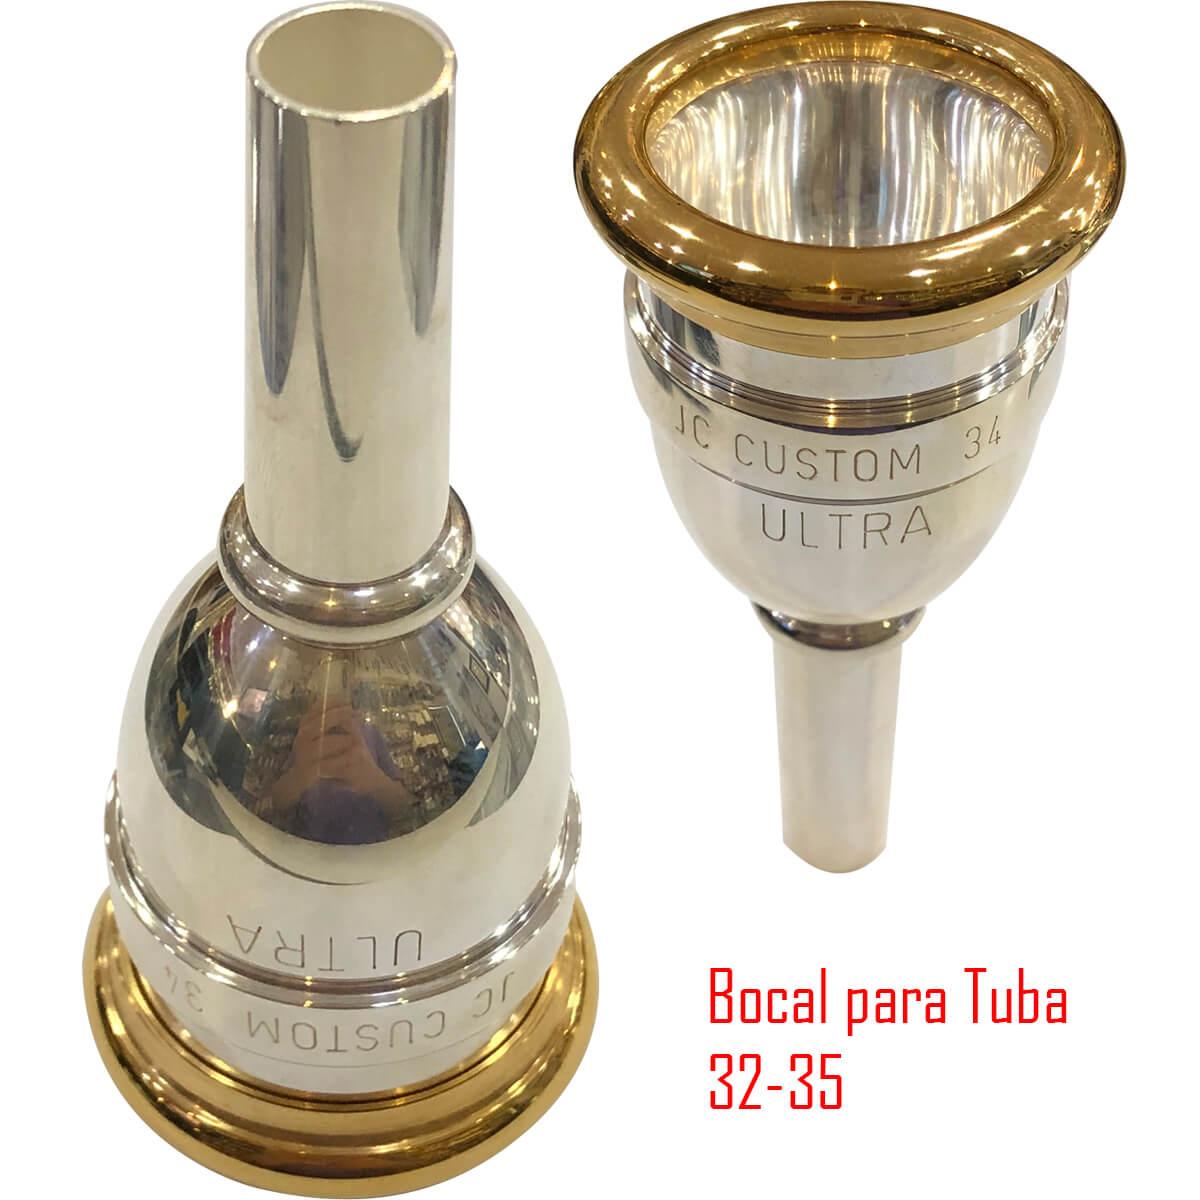 Bocal Para Tuba - Ultra - Jc Custom